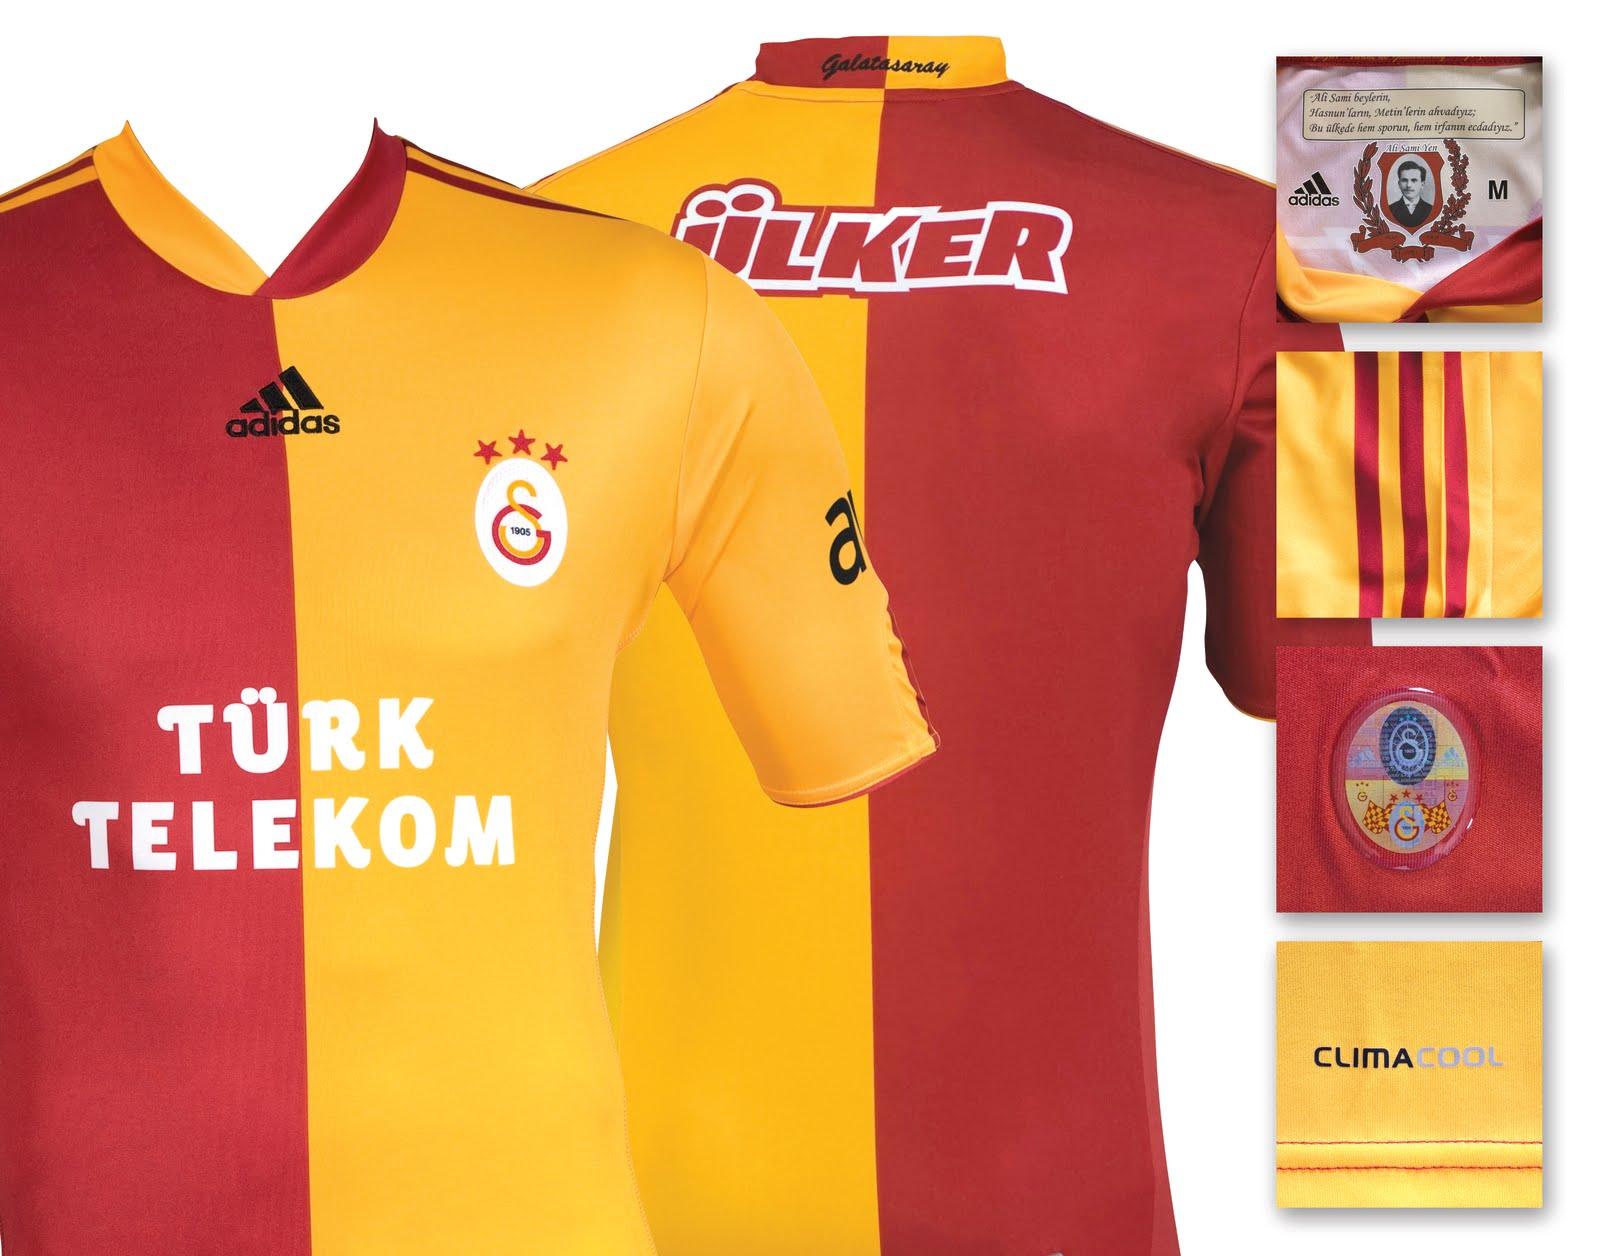 http://1.bp.blogspot.com/_2Z1bUr5gaAs/TE9LVpNZzzI/AAAAAAAAAsc/bSD0A08rNjc/s1600/Galatasaray+Par%C3%A7al%C4%B1.jpg